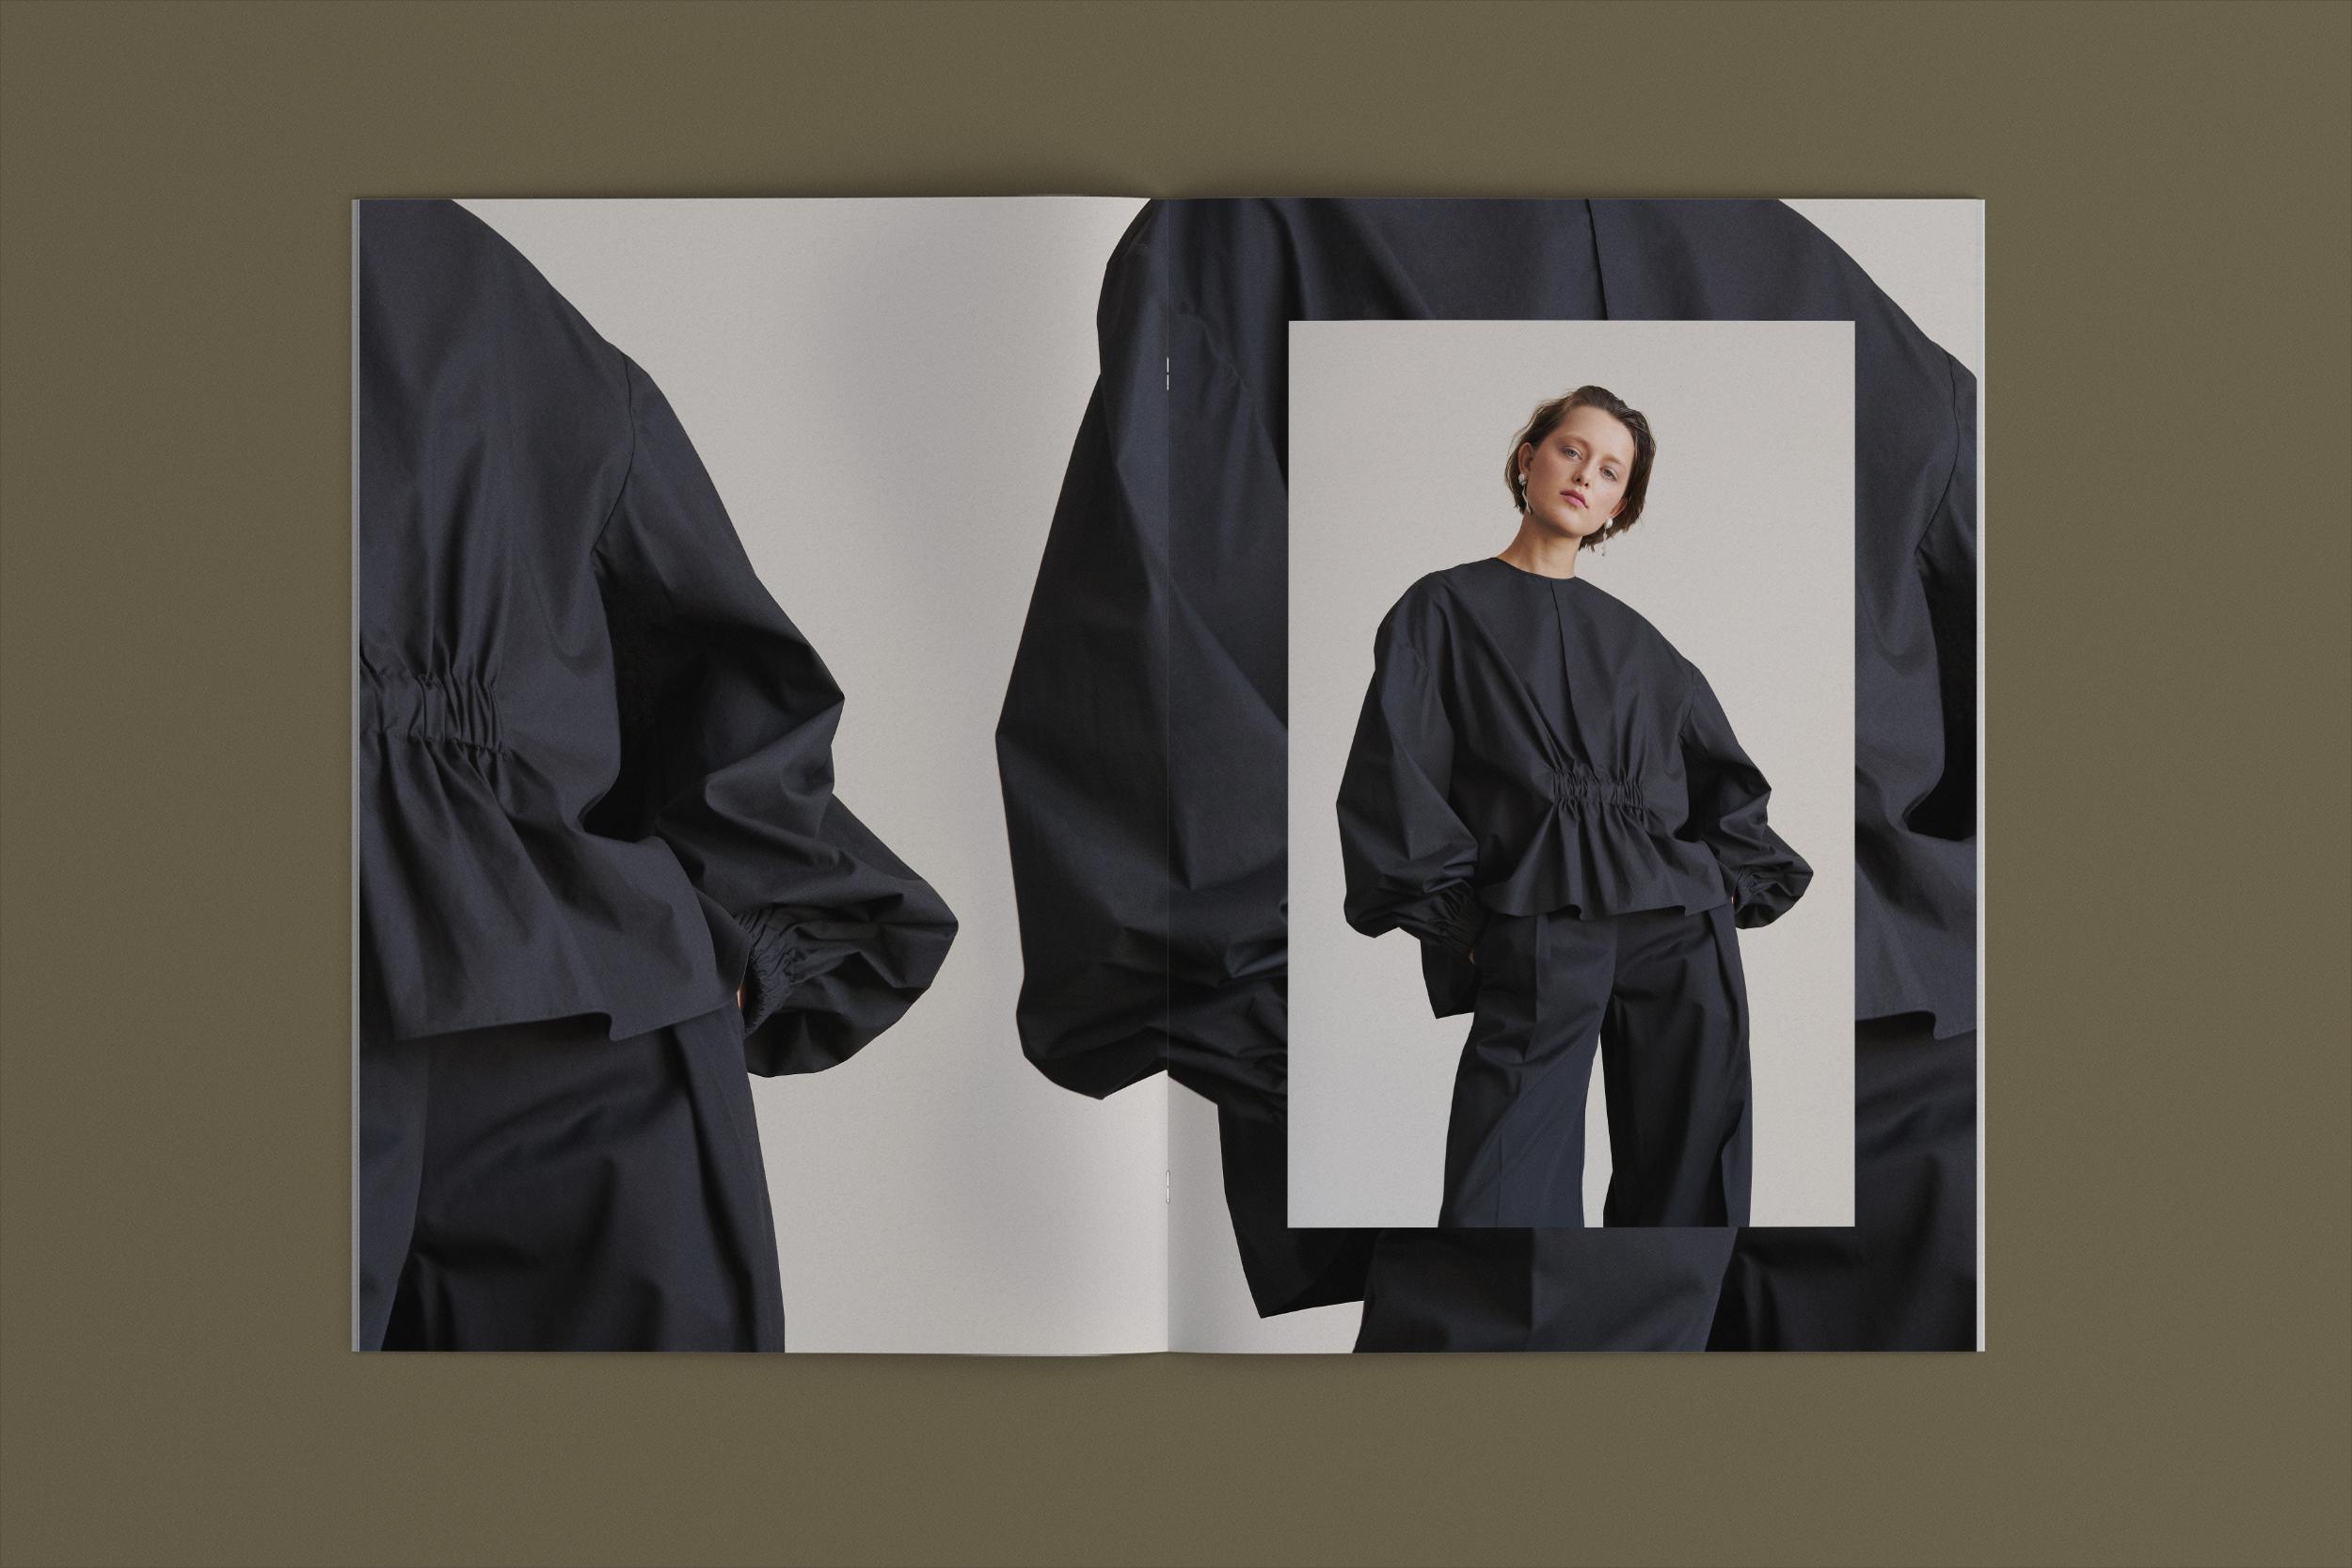 Fabiana-Pigna-Lookbook-FW19-spread1.jpg